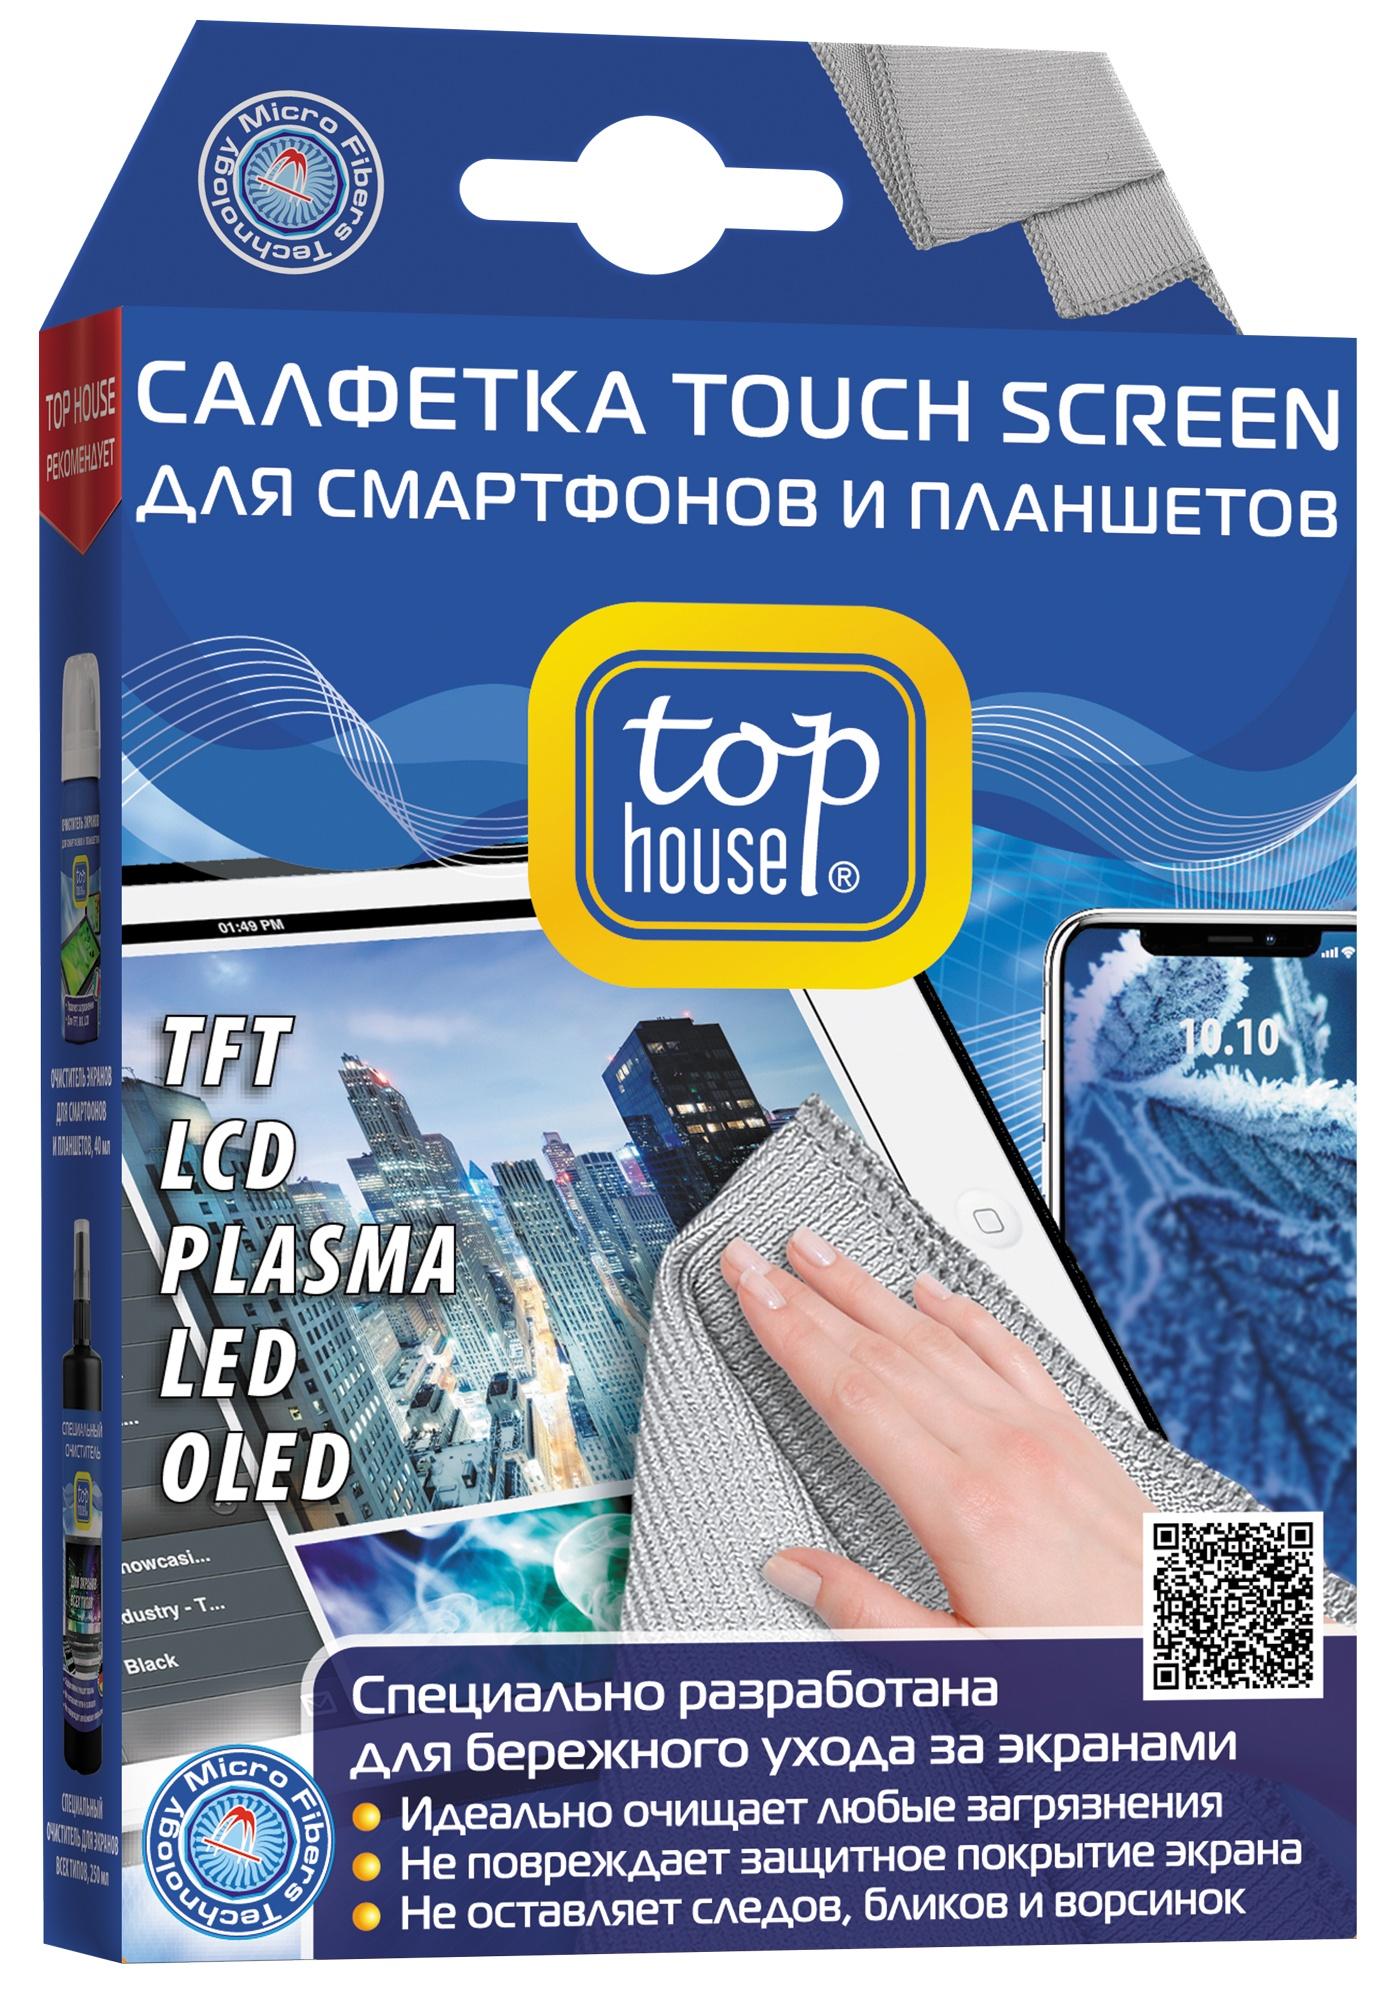 Салфетка для смартфонов и планшетов Top House Touch Screen, 15 см х 20 см набор для смартфонов и планшетов top house очиститель салфетка 40 мл